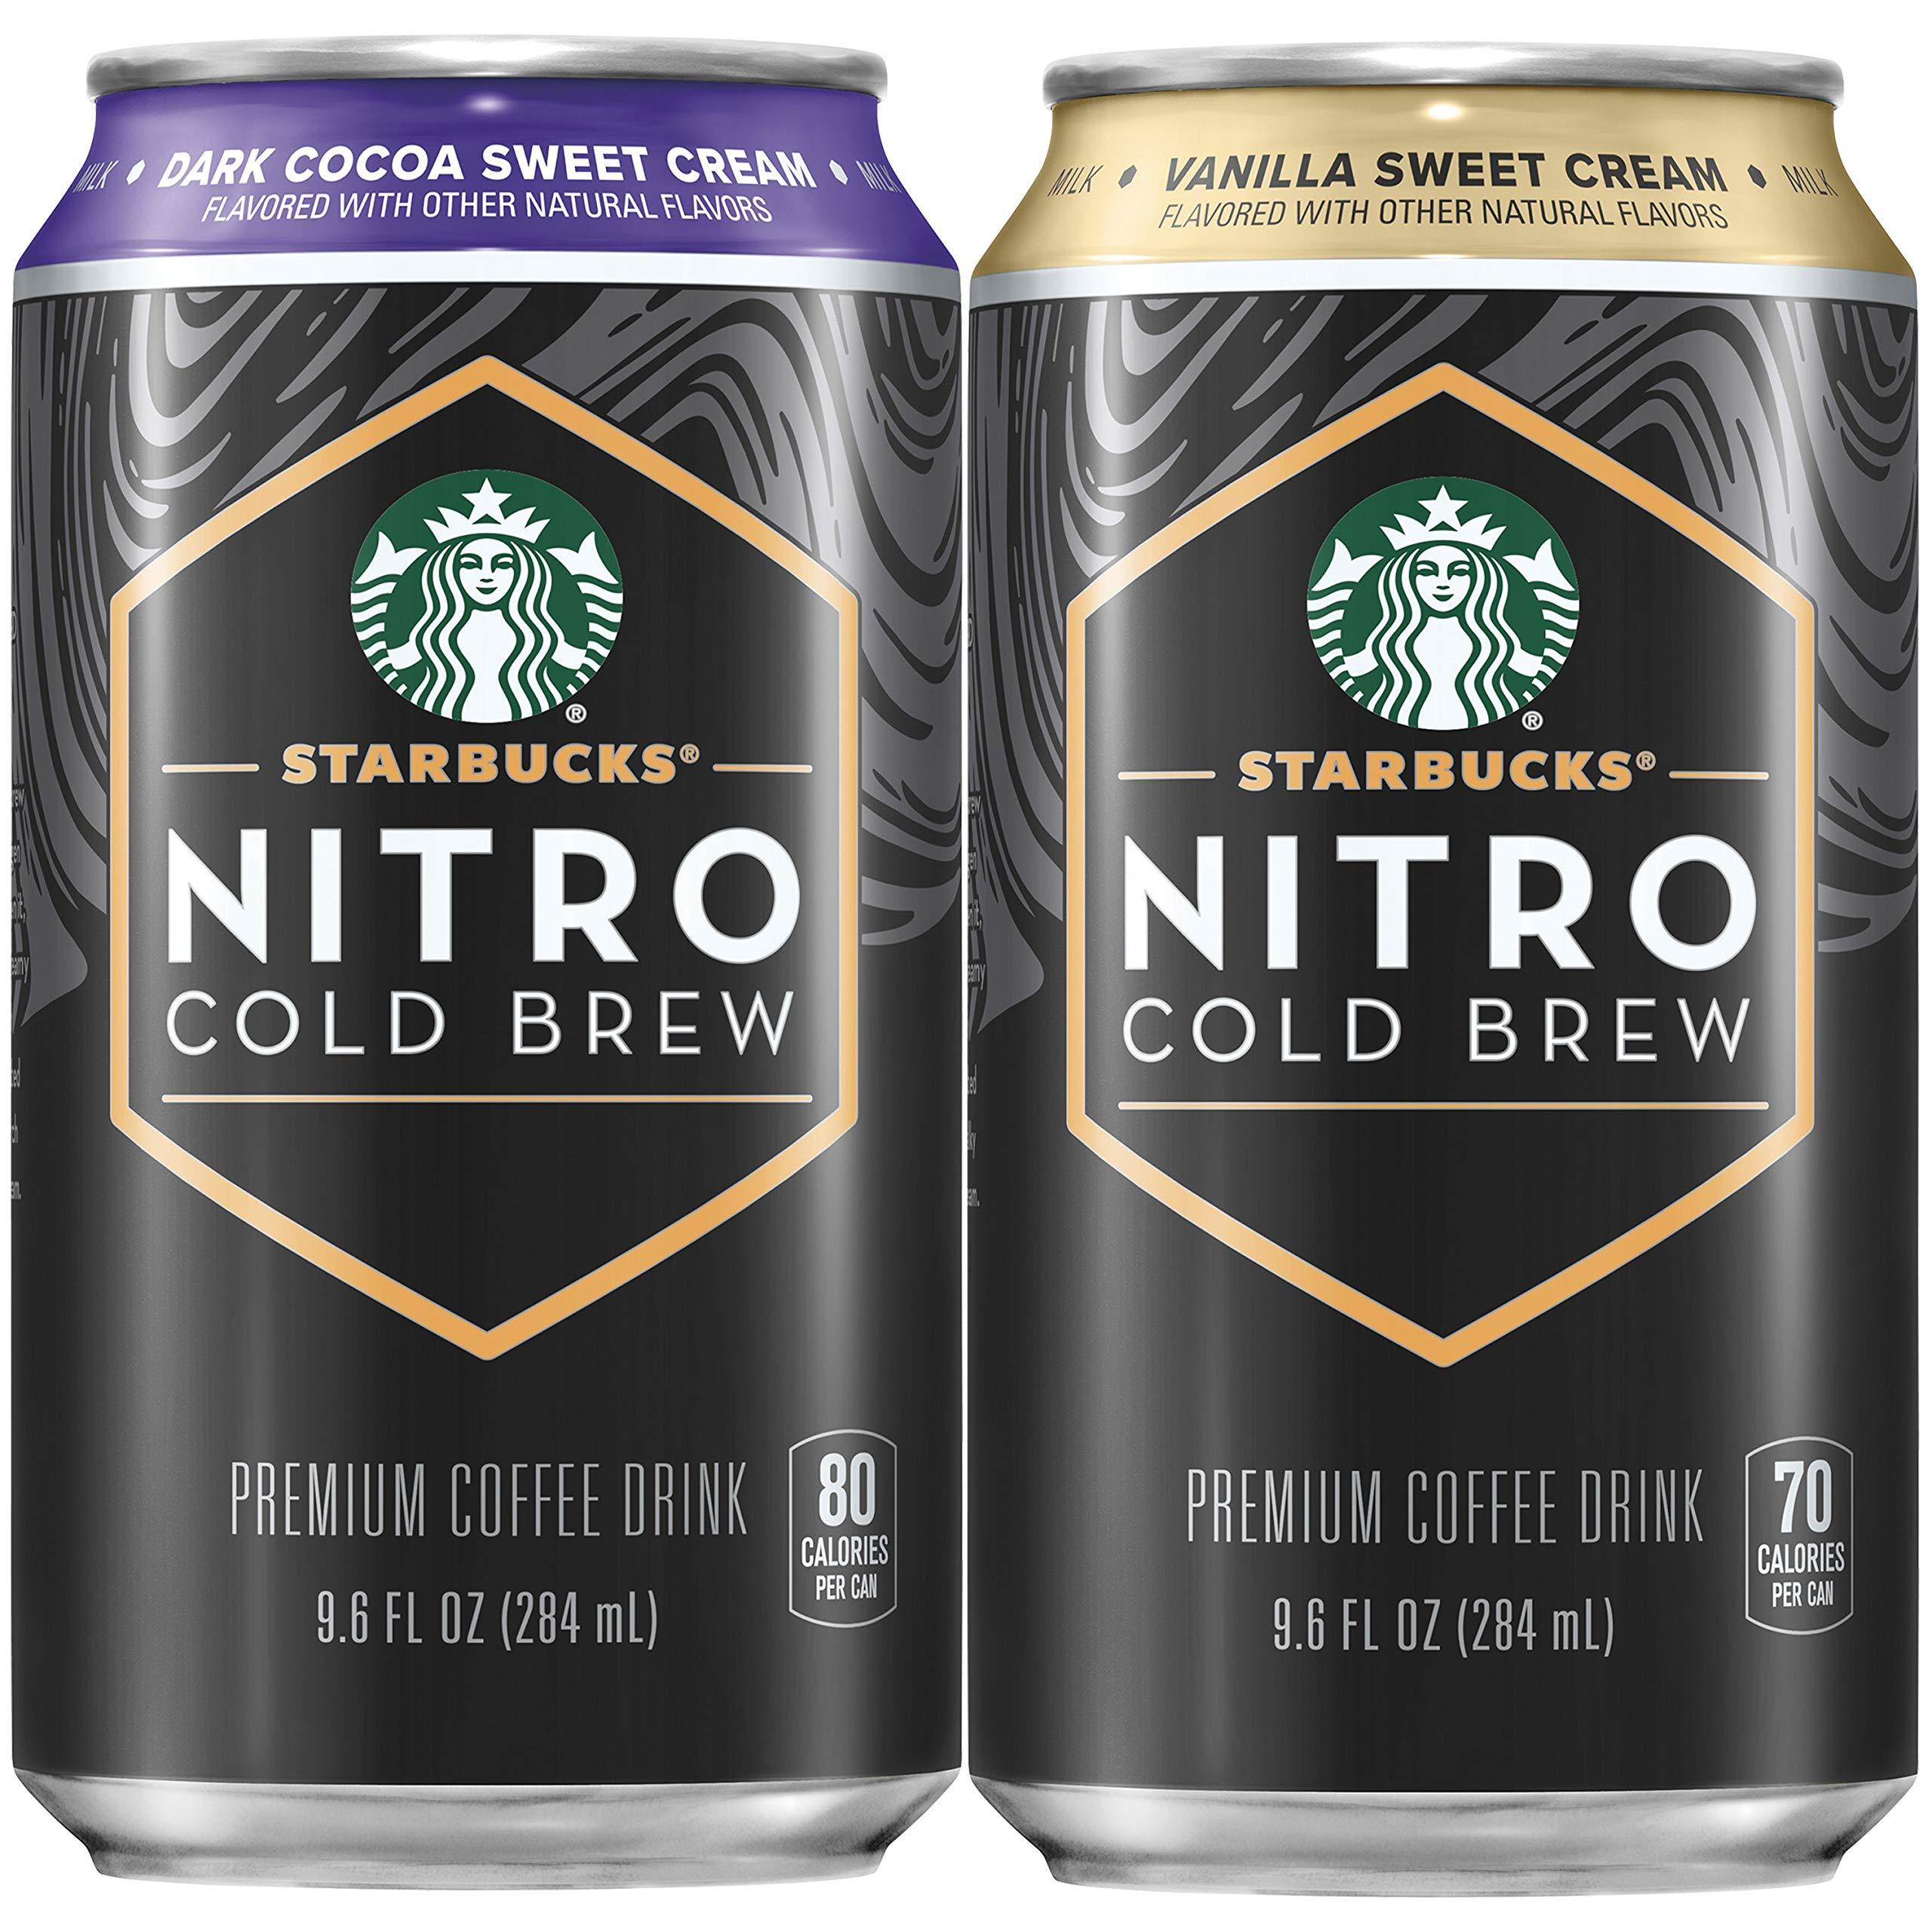 Starbucks Nitro Cold Brew, 2 Flavor Sweet Cream Variety Pack, 9.6 fl oz Cans (8 Pack)